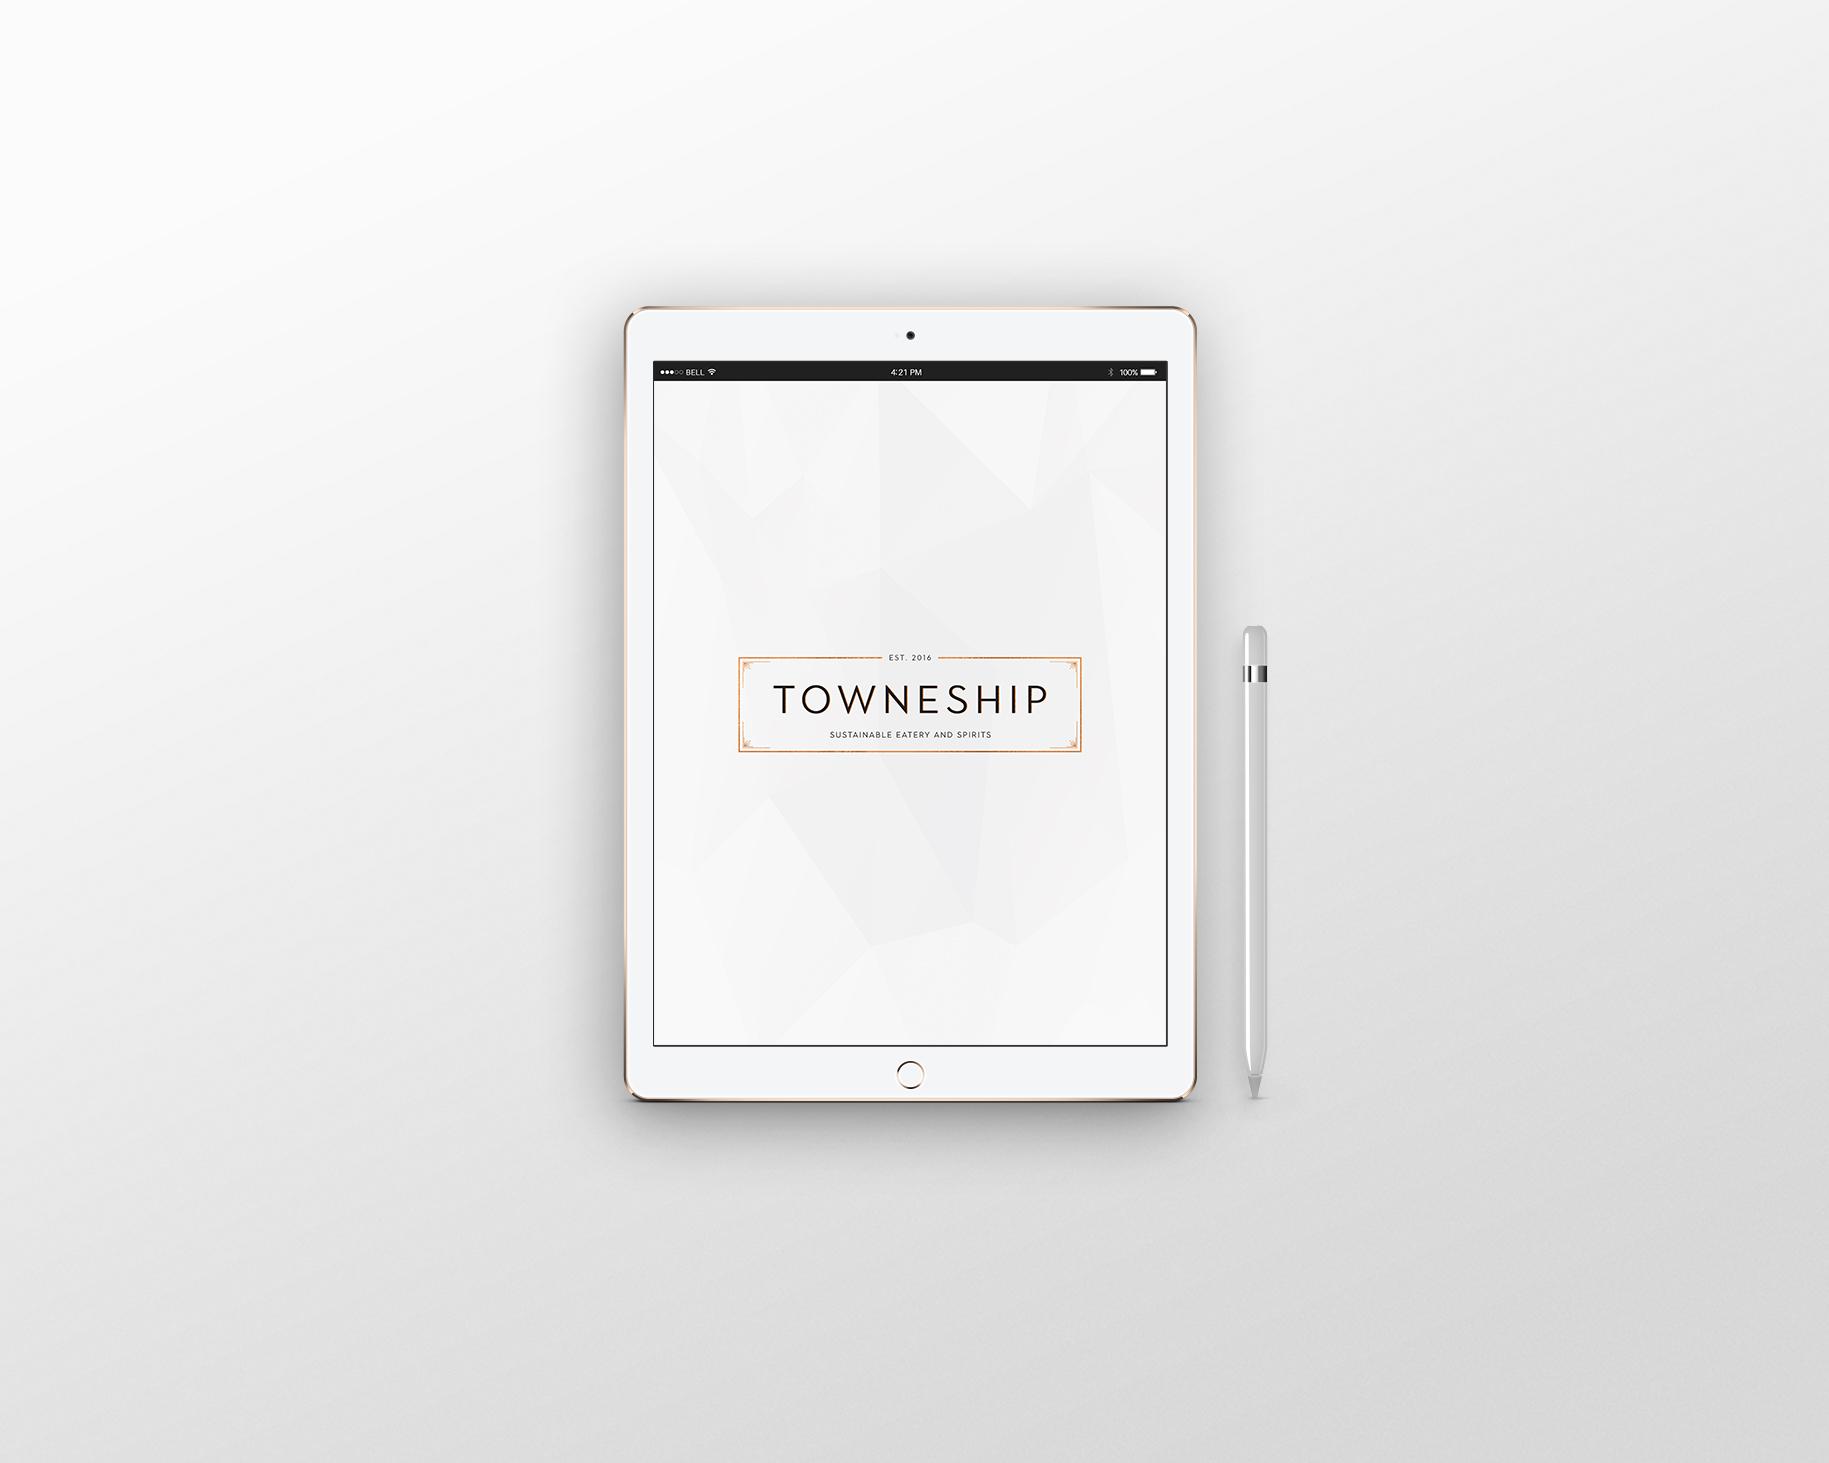 Towneship.jpg